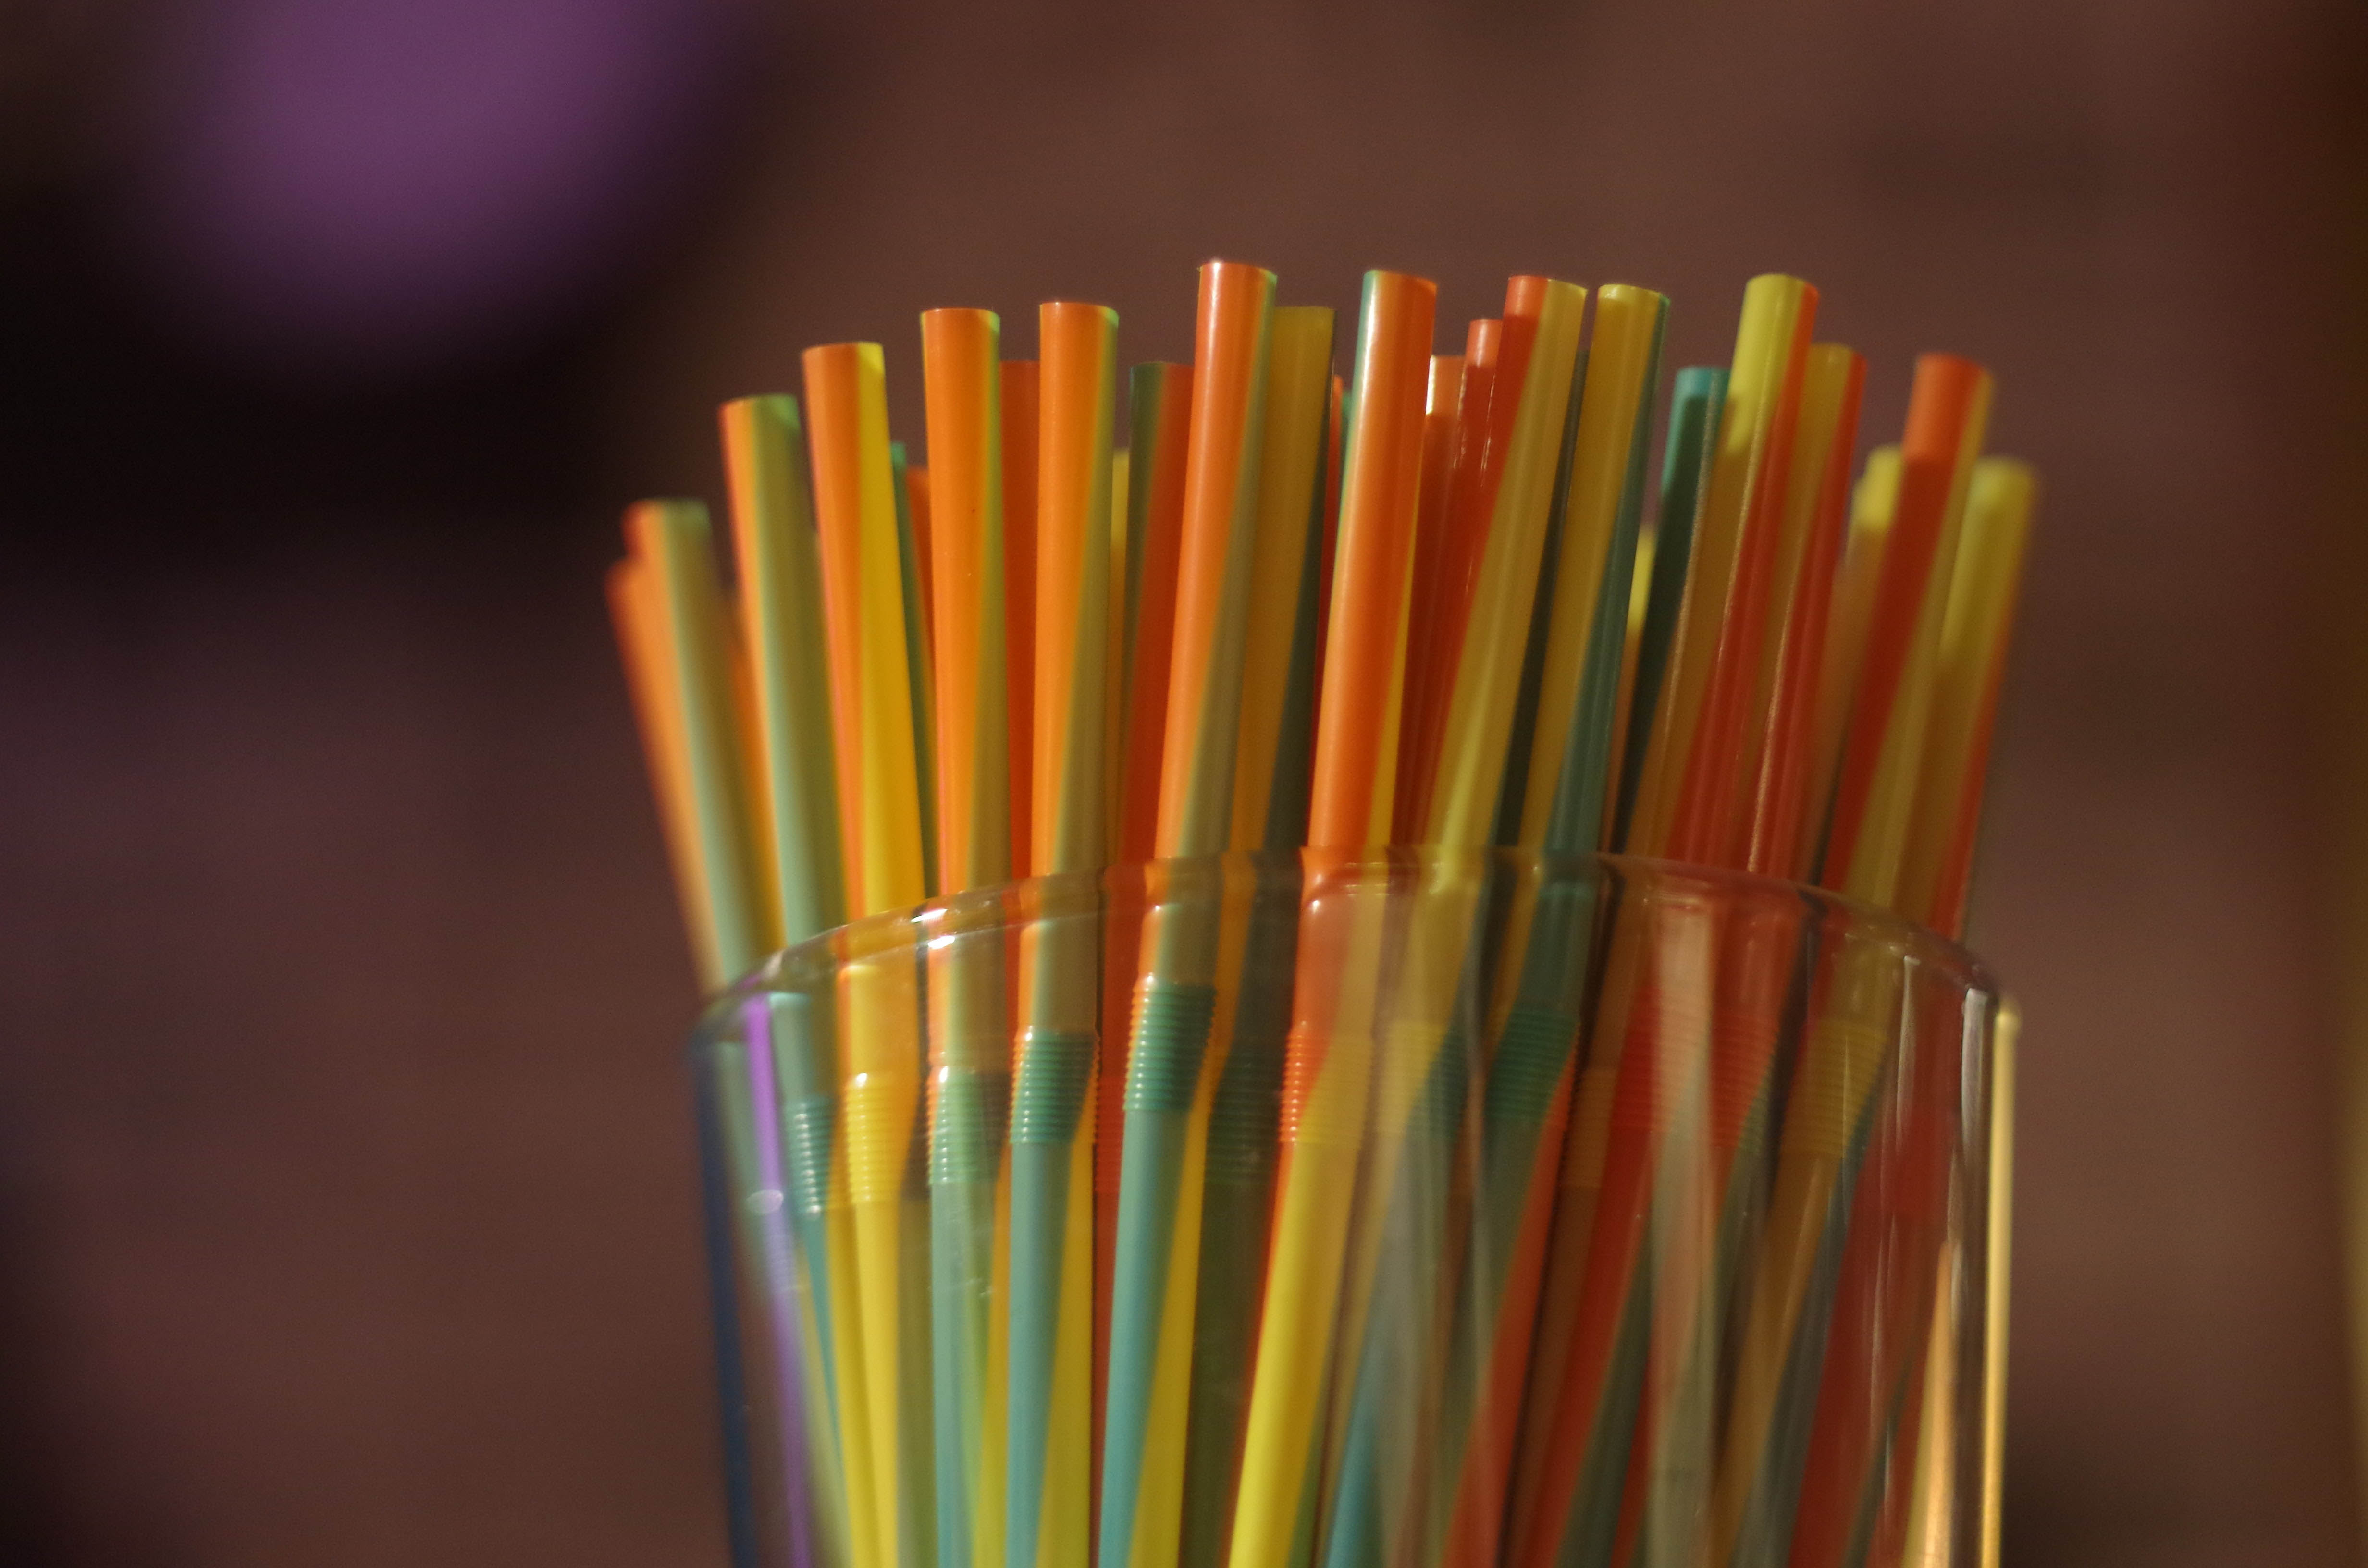 McDonald's to ditch plastic straws in UK, Ireland | TheFoundations TV